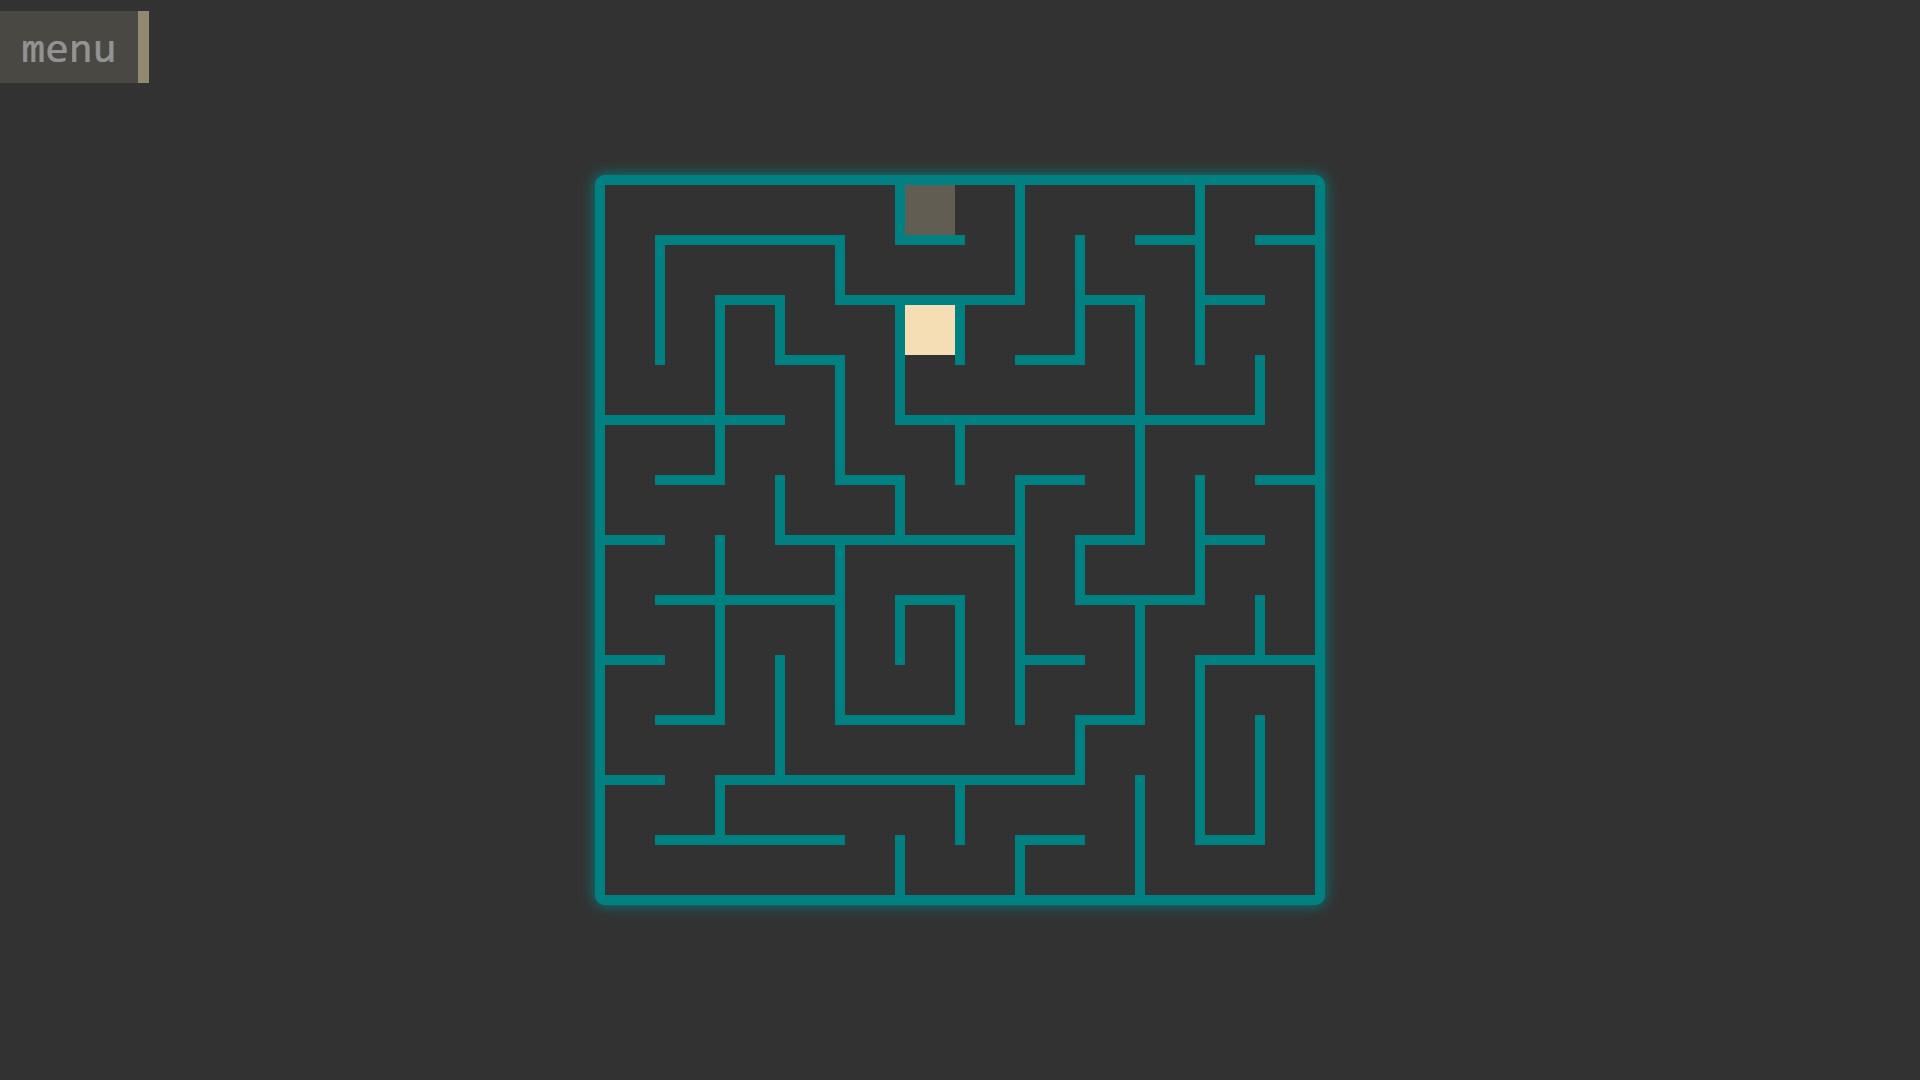 labyrinth 2 screenshot